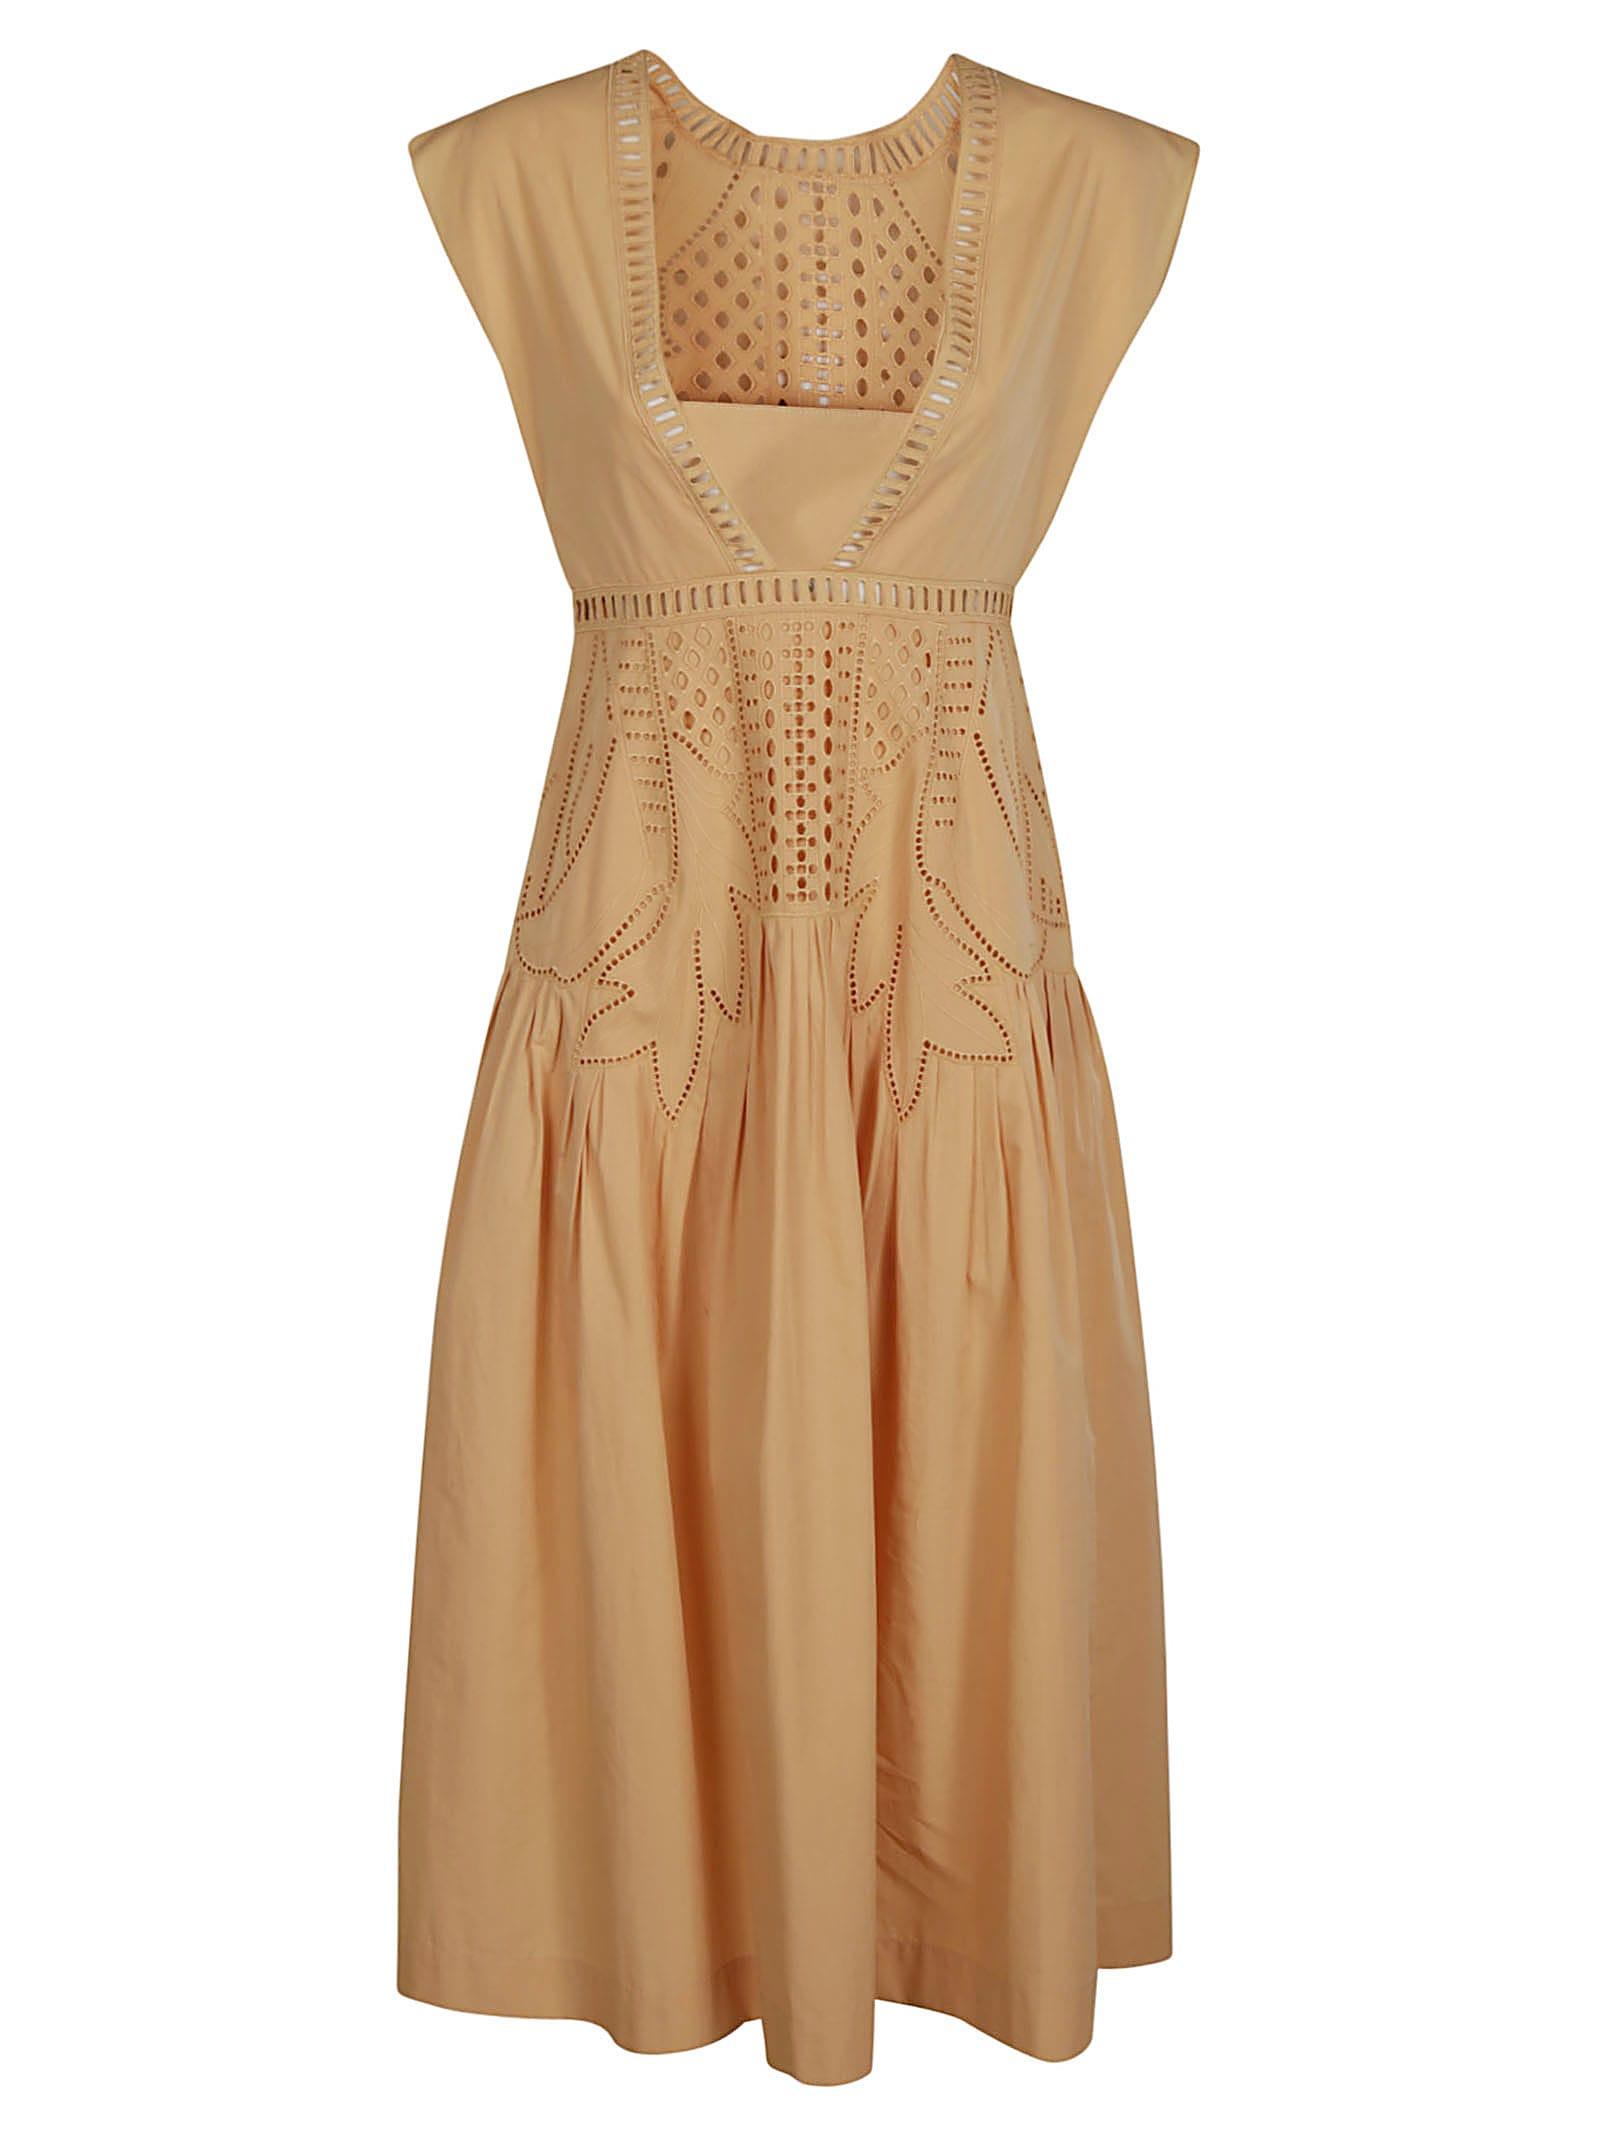 Alberta Ferretti Perforated Sleeveless Dress